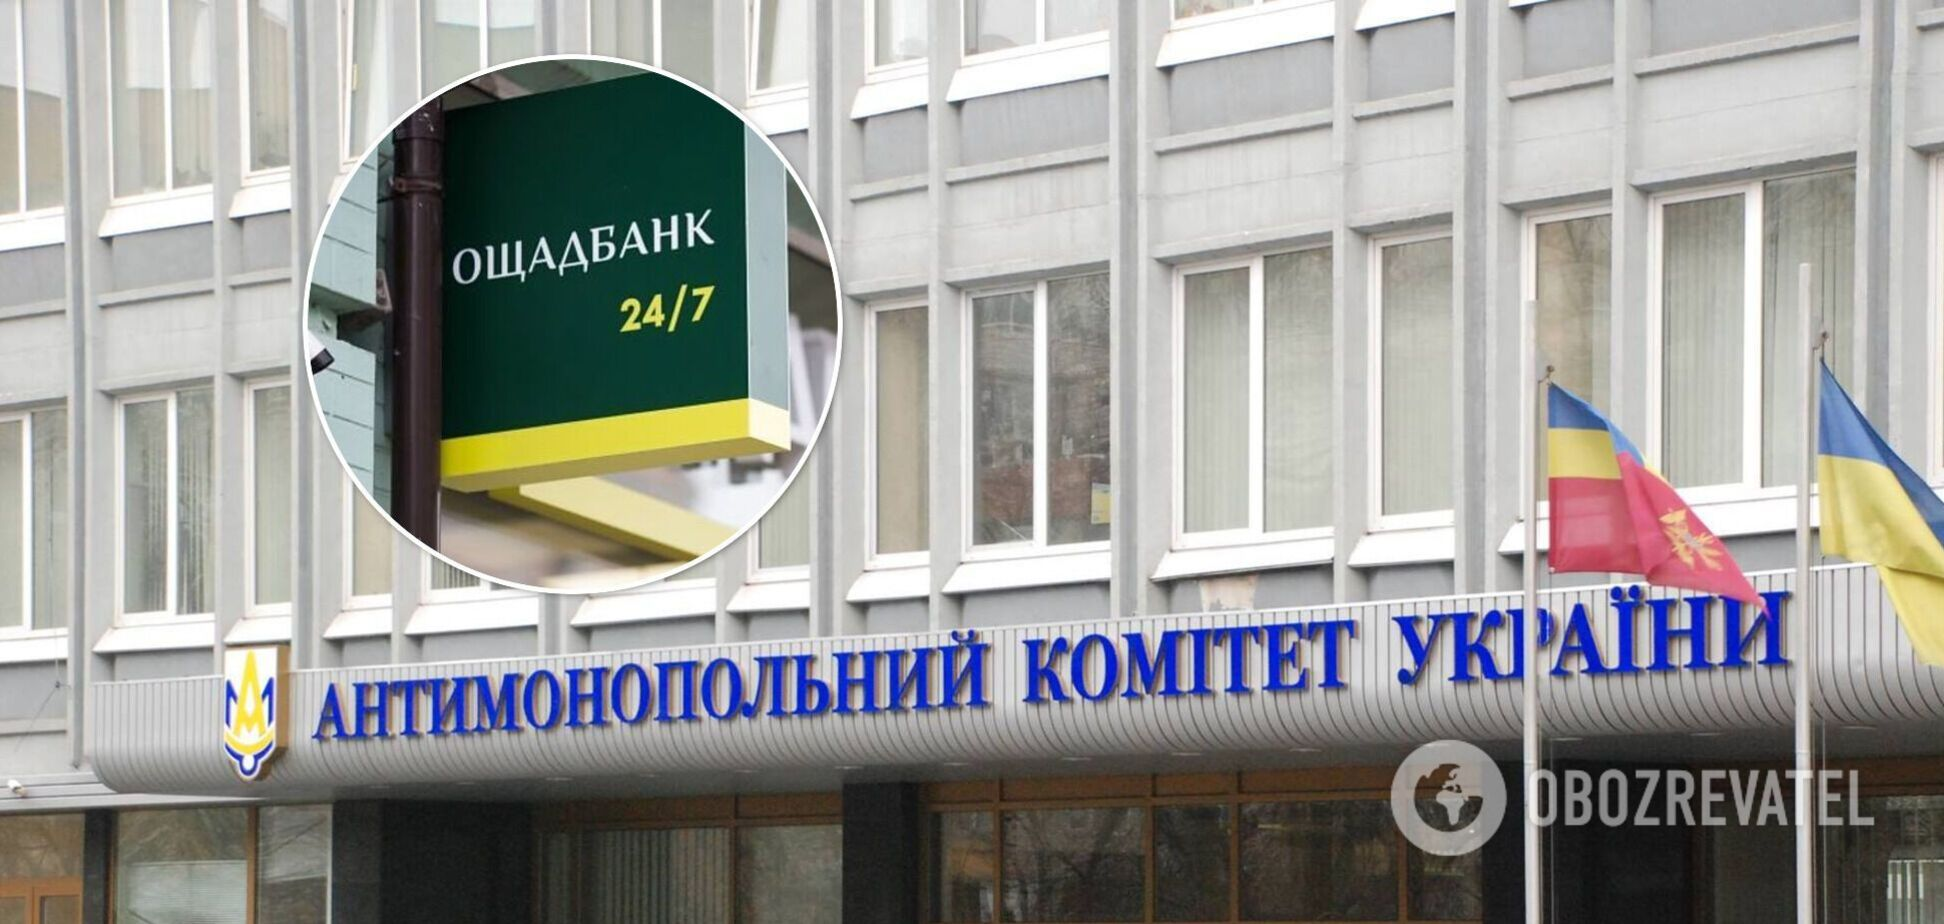 АМКУ оштрафував Ощадбанк майже на 14 млн грн